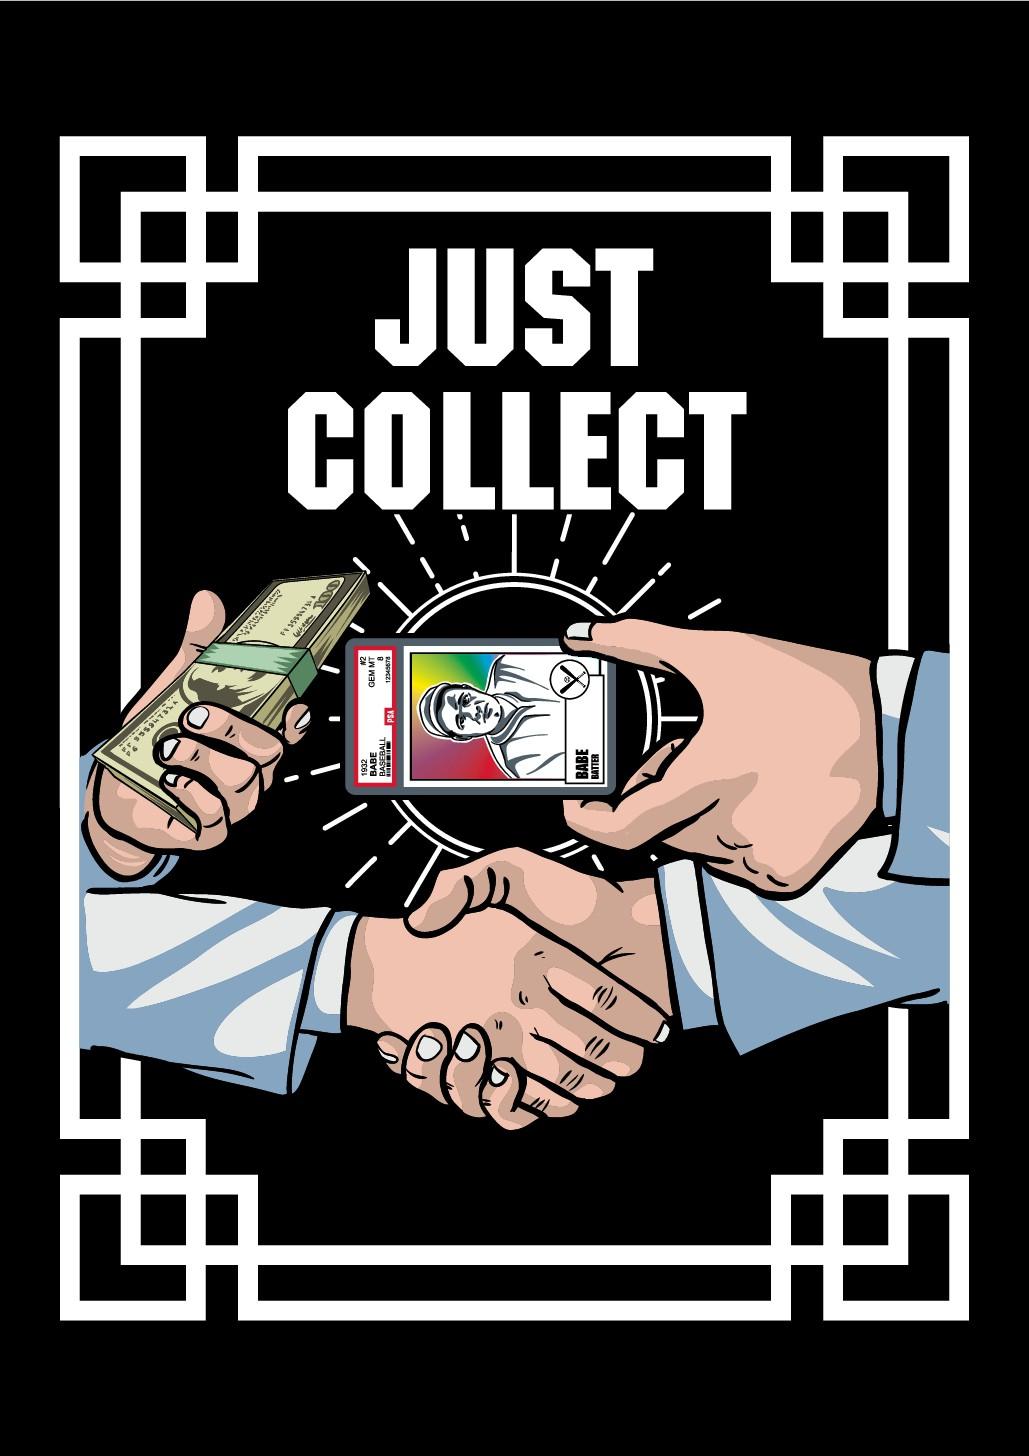 Cool T-shirt Design for Sports Card Collectors & Investors.